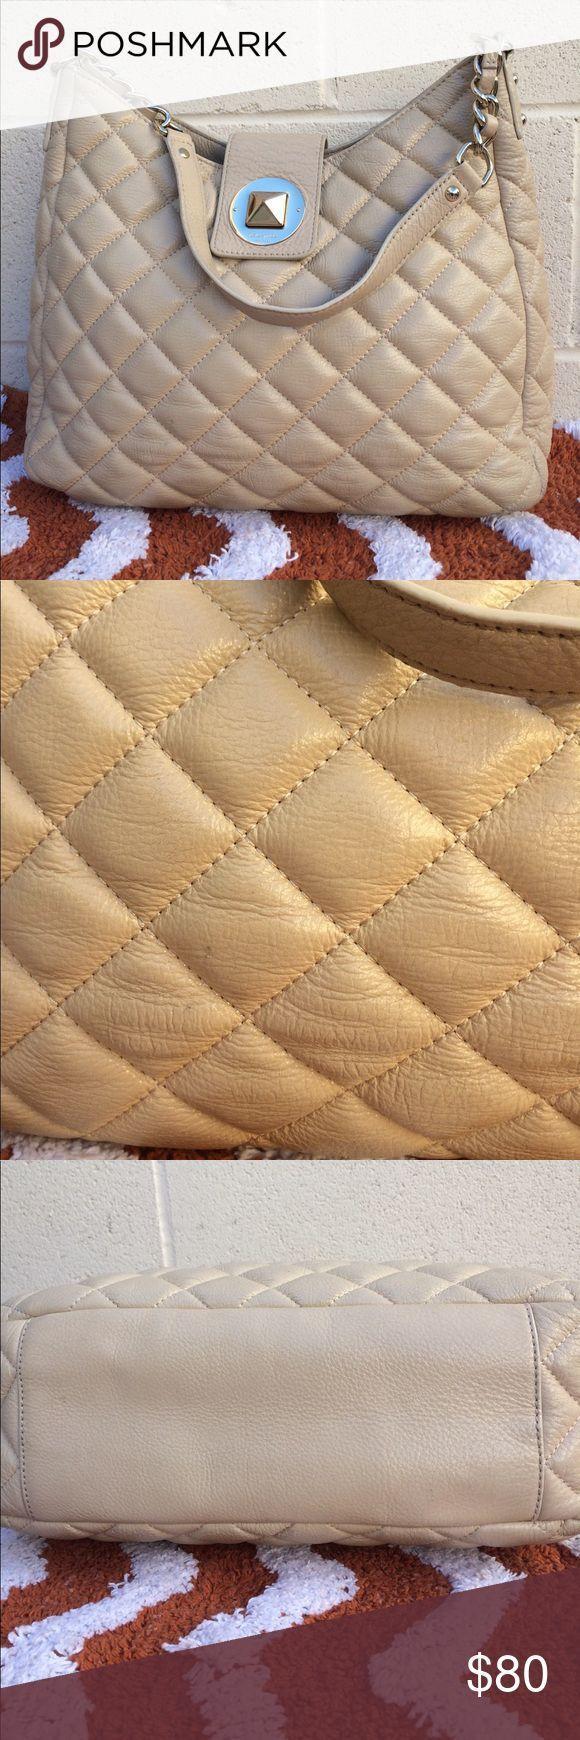 Tendance salopette 2017  Kate Spade Gold Coast quilted Janica handbag Genuine leather handbag. please che